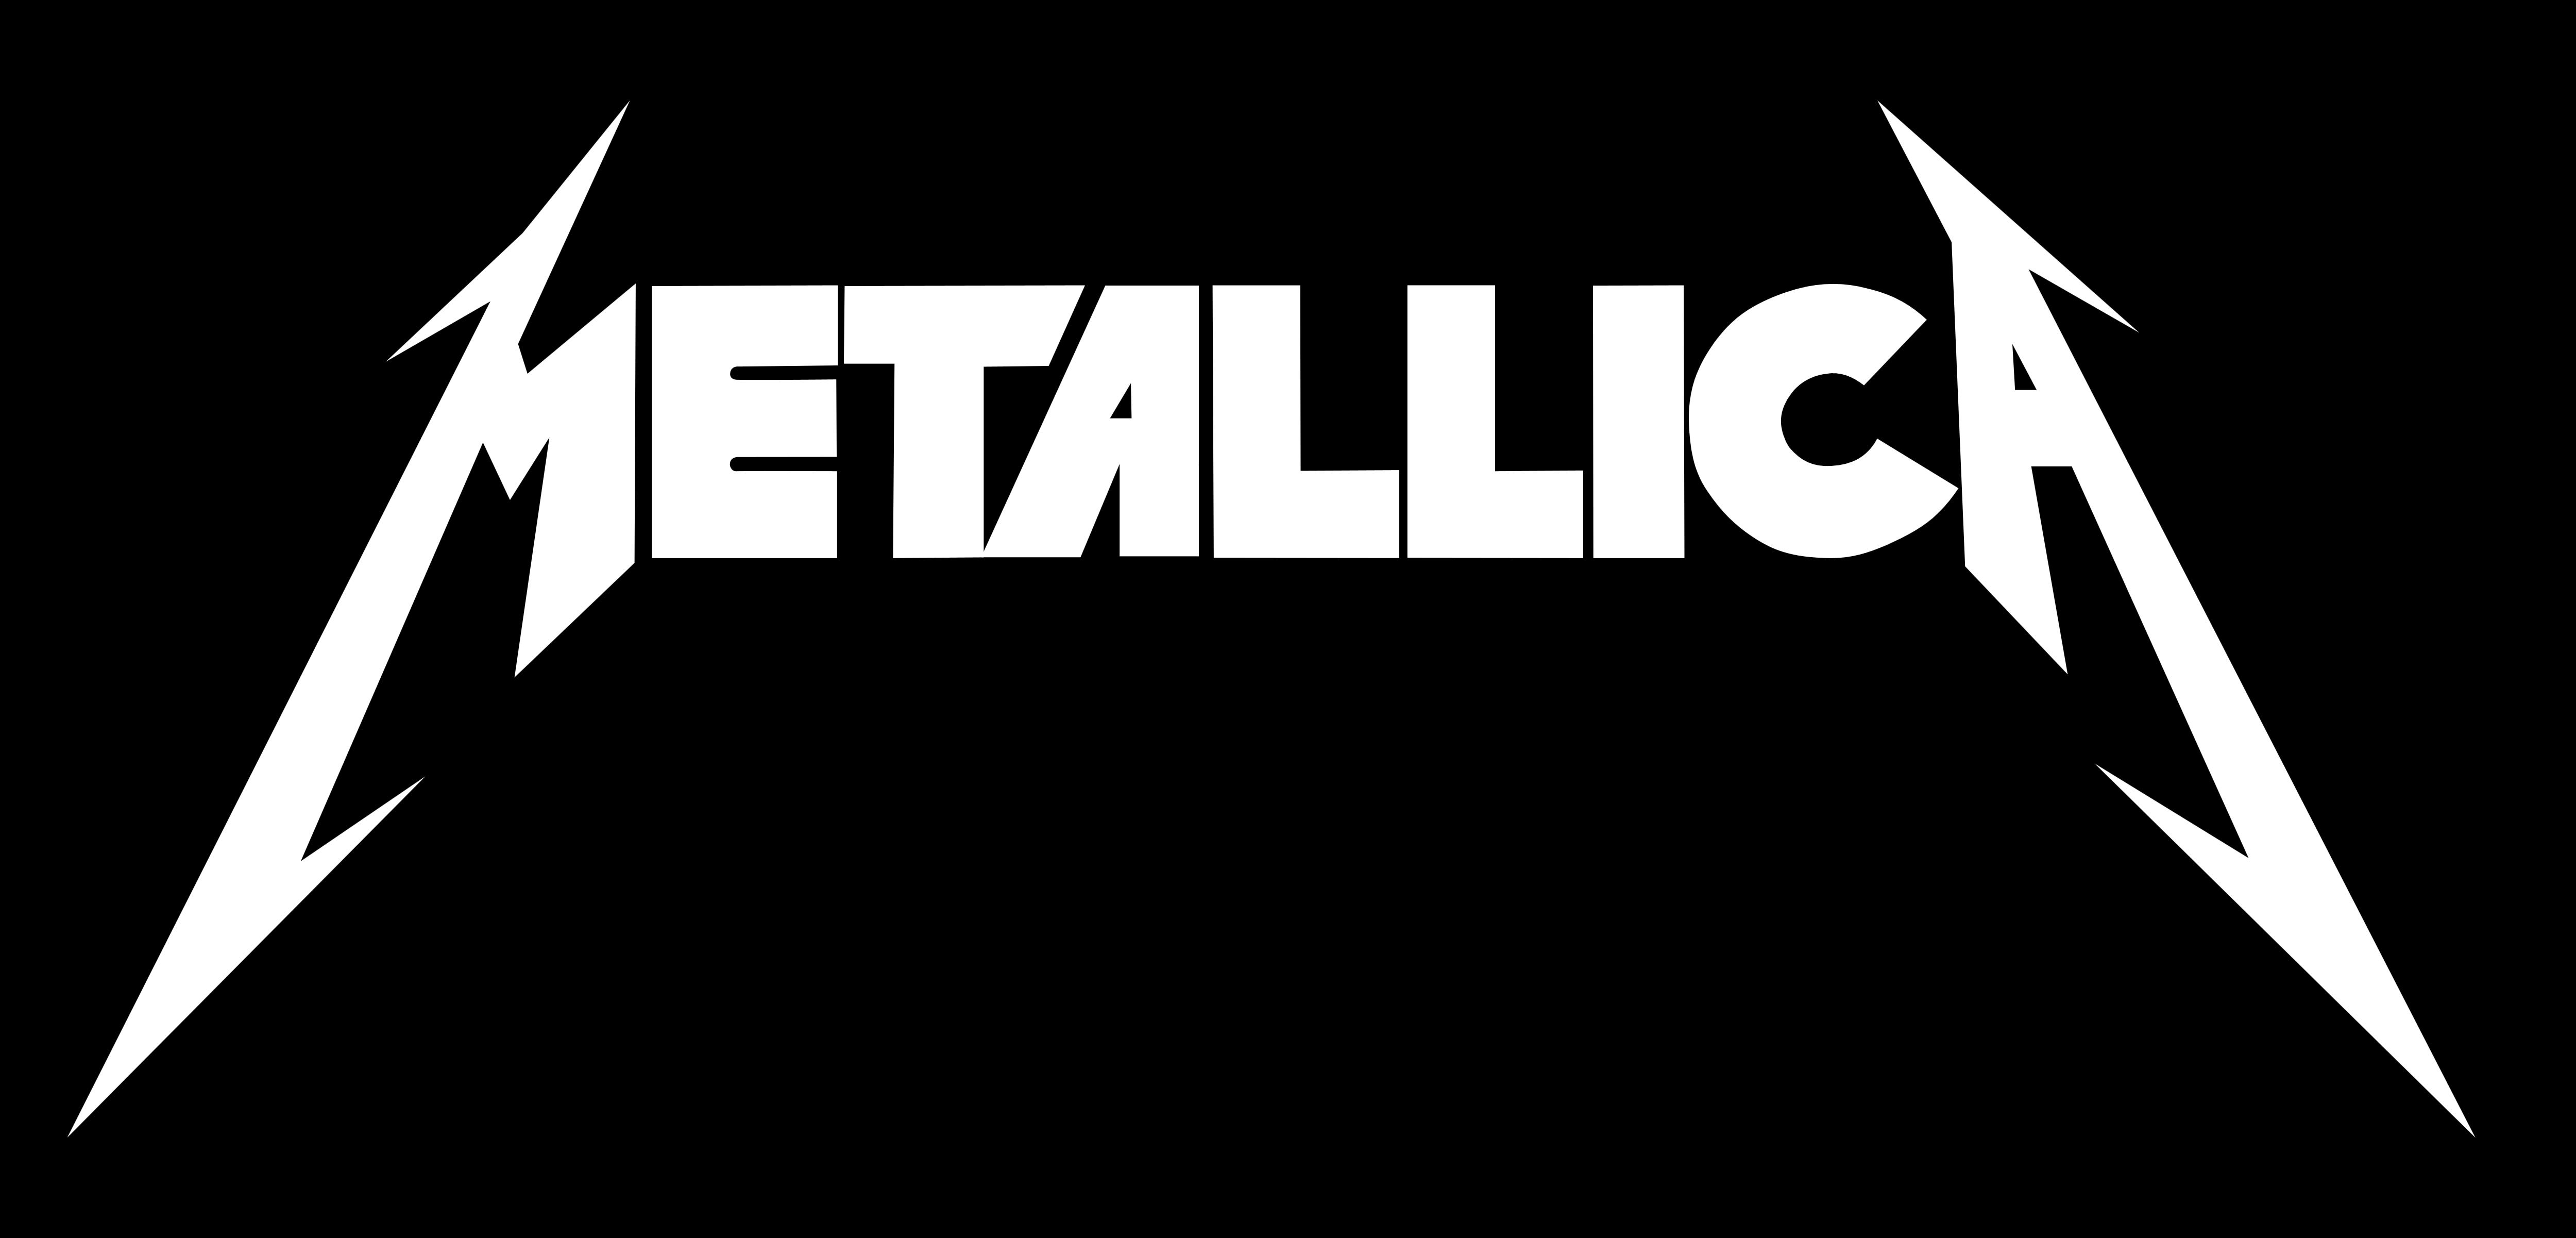 Metallica logo, black - Metallica PNG